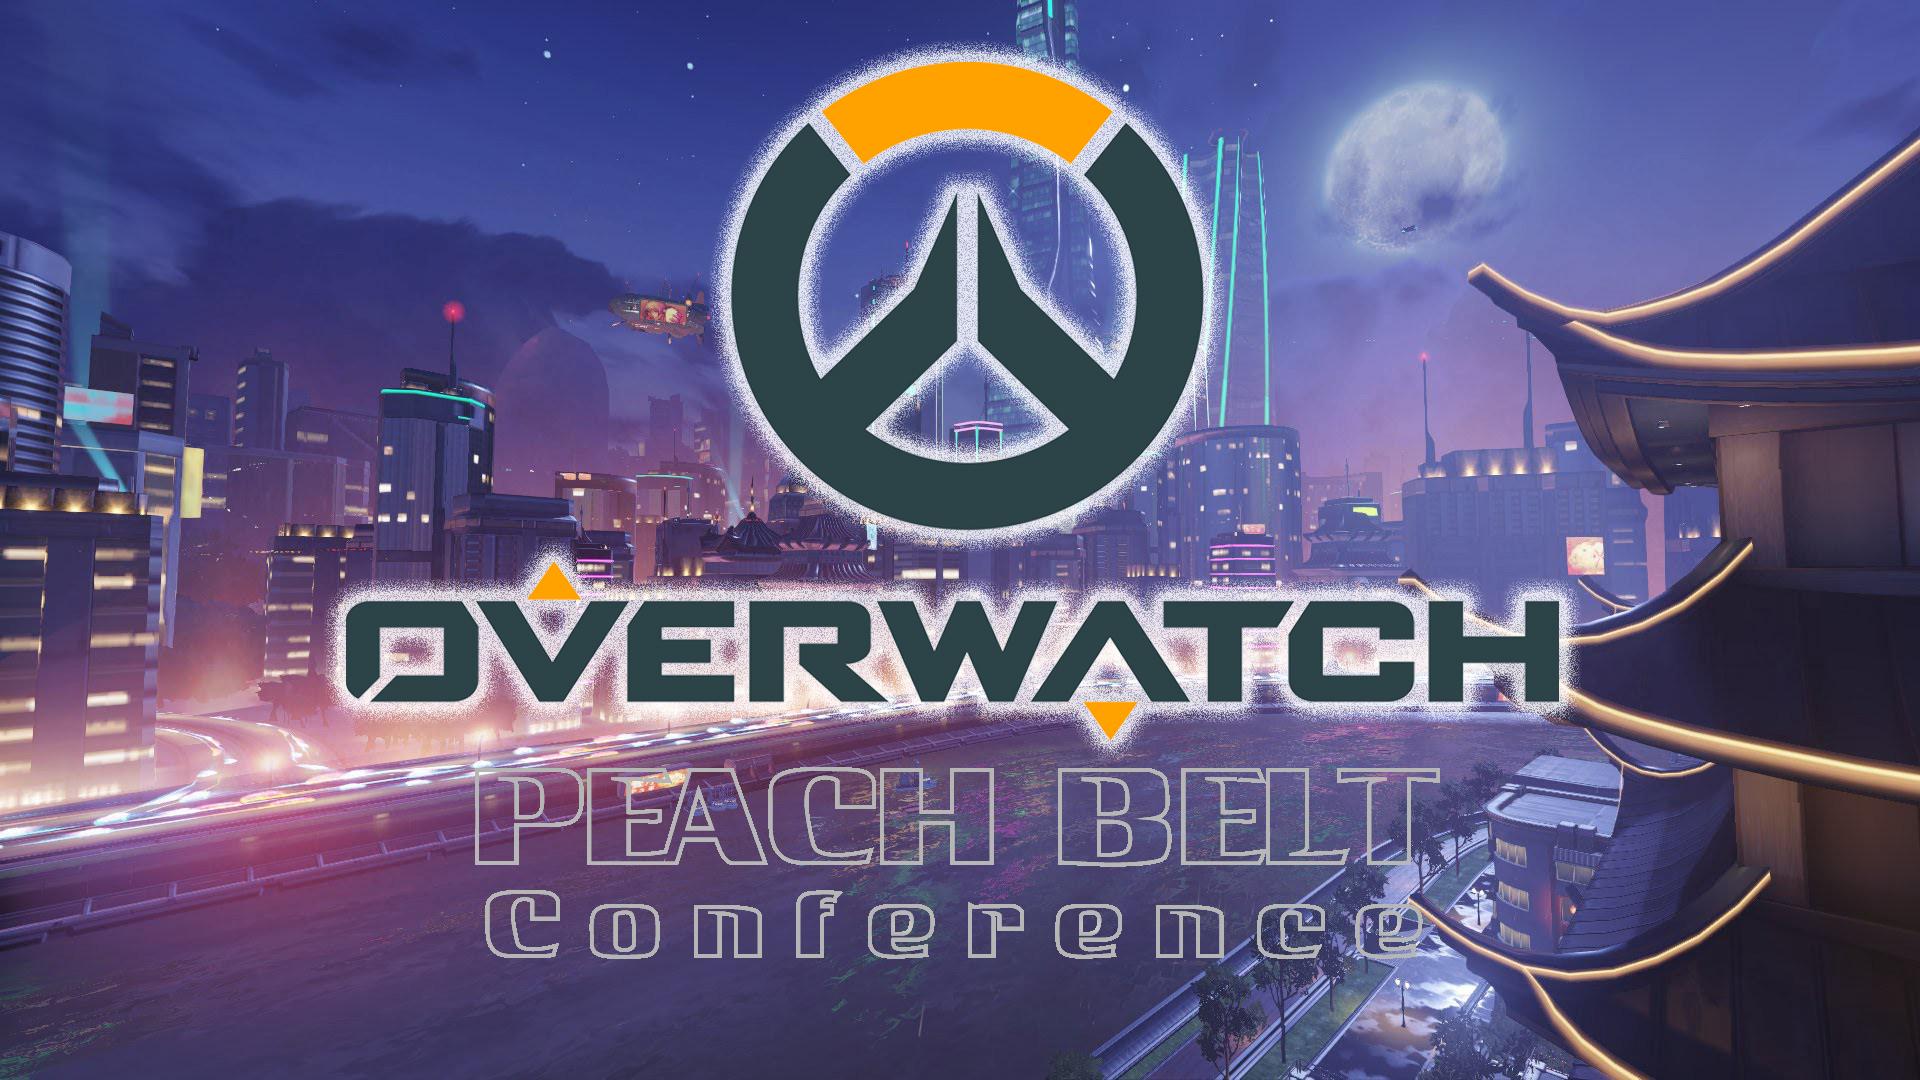 Overwatch Peach Belt Conference